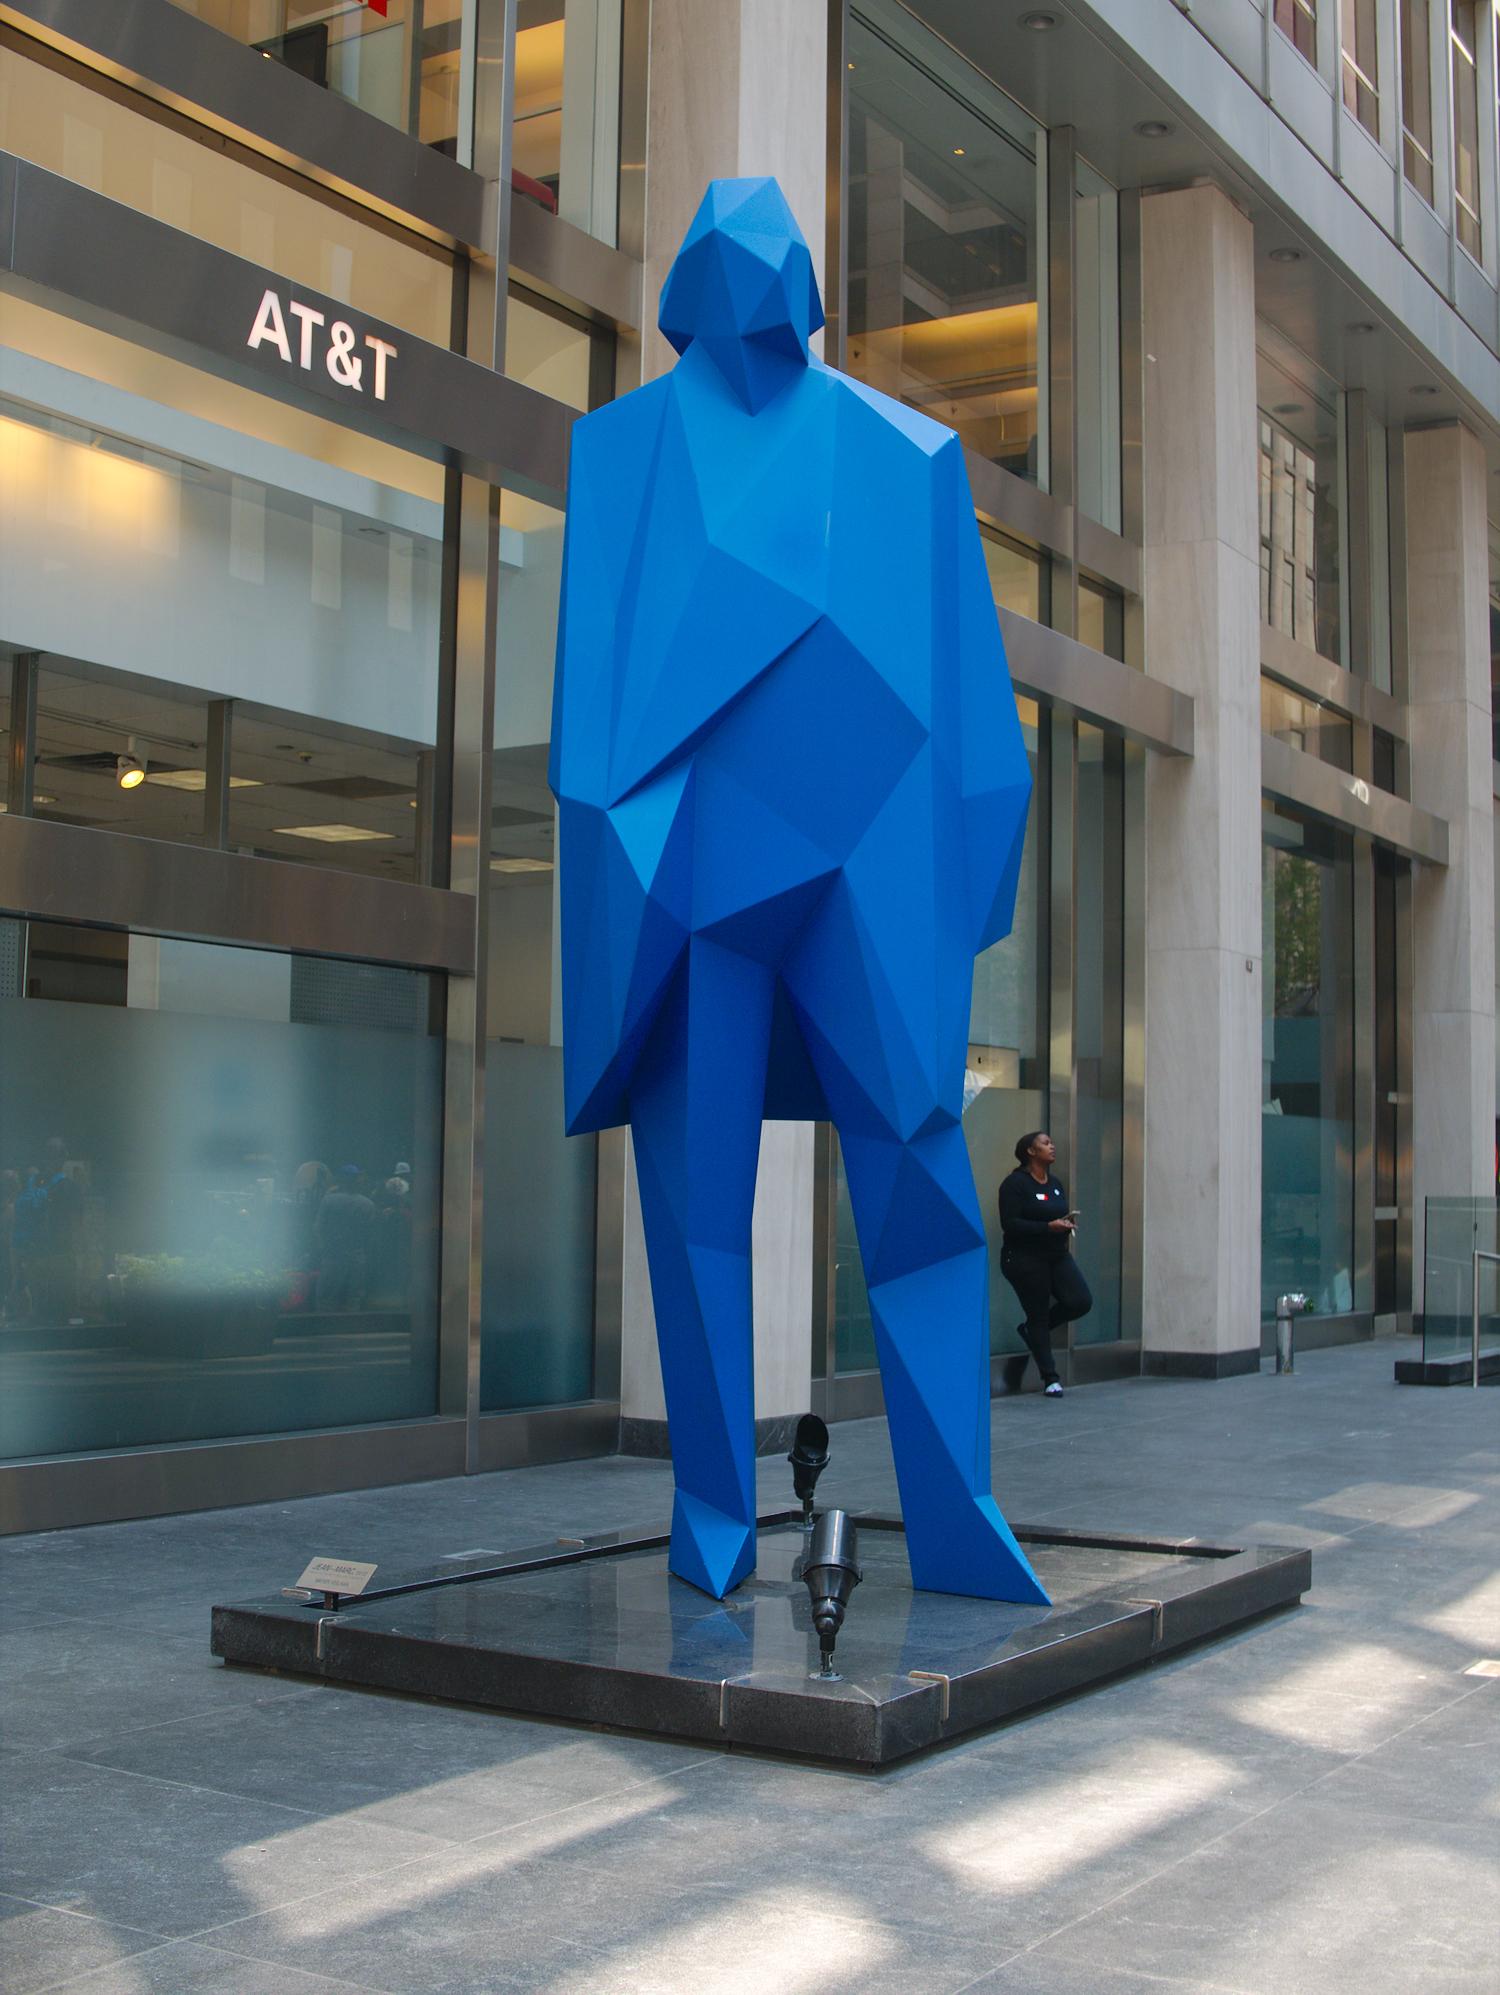 Big blue statue